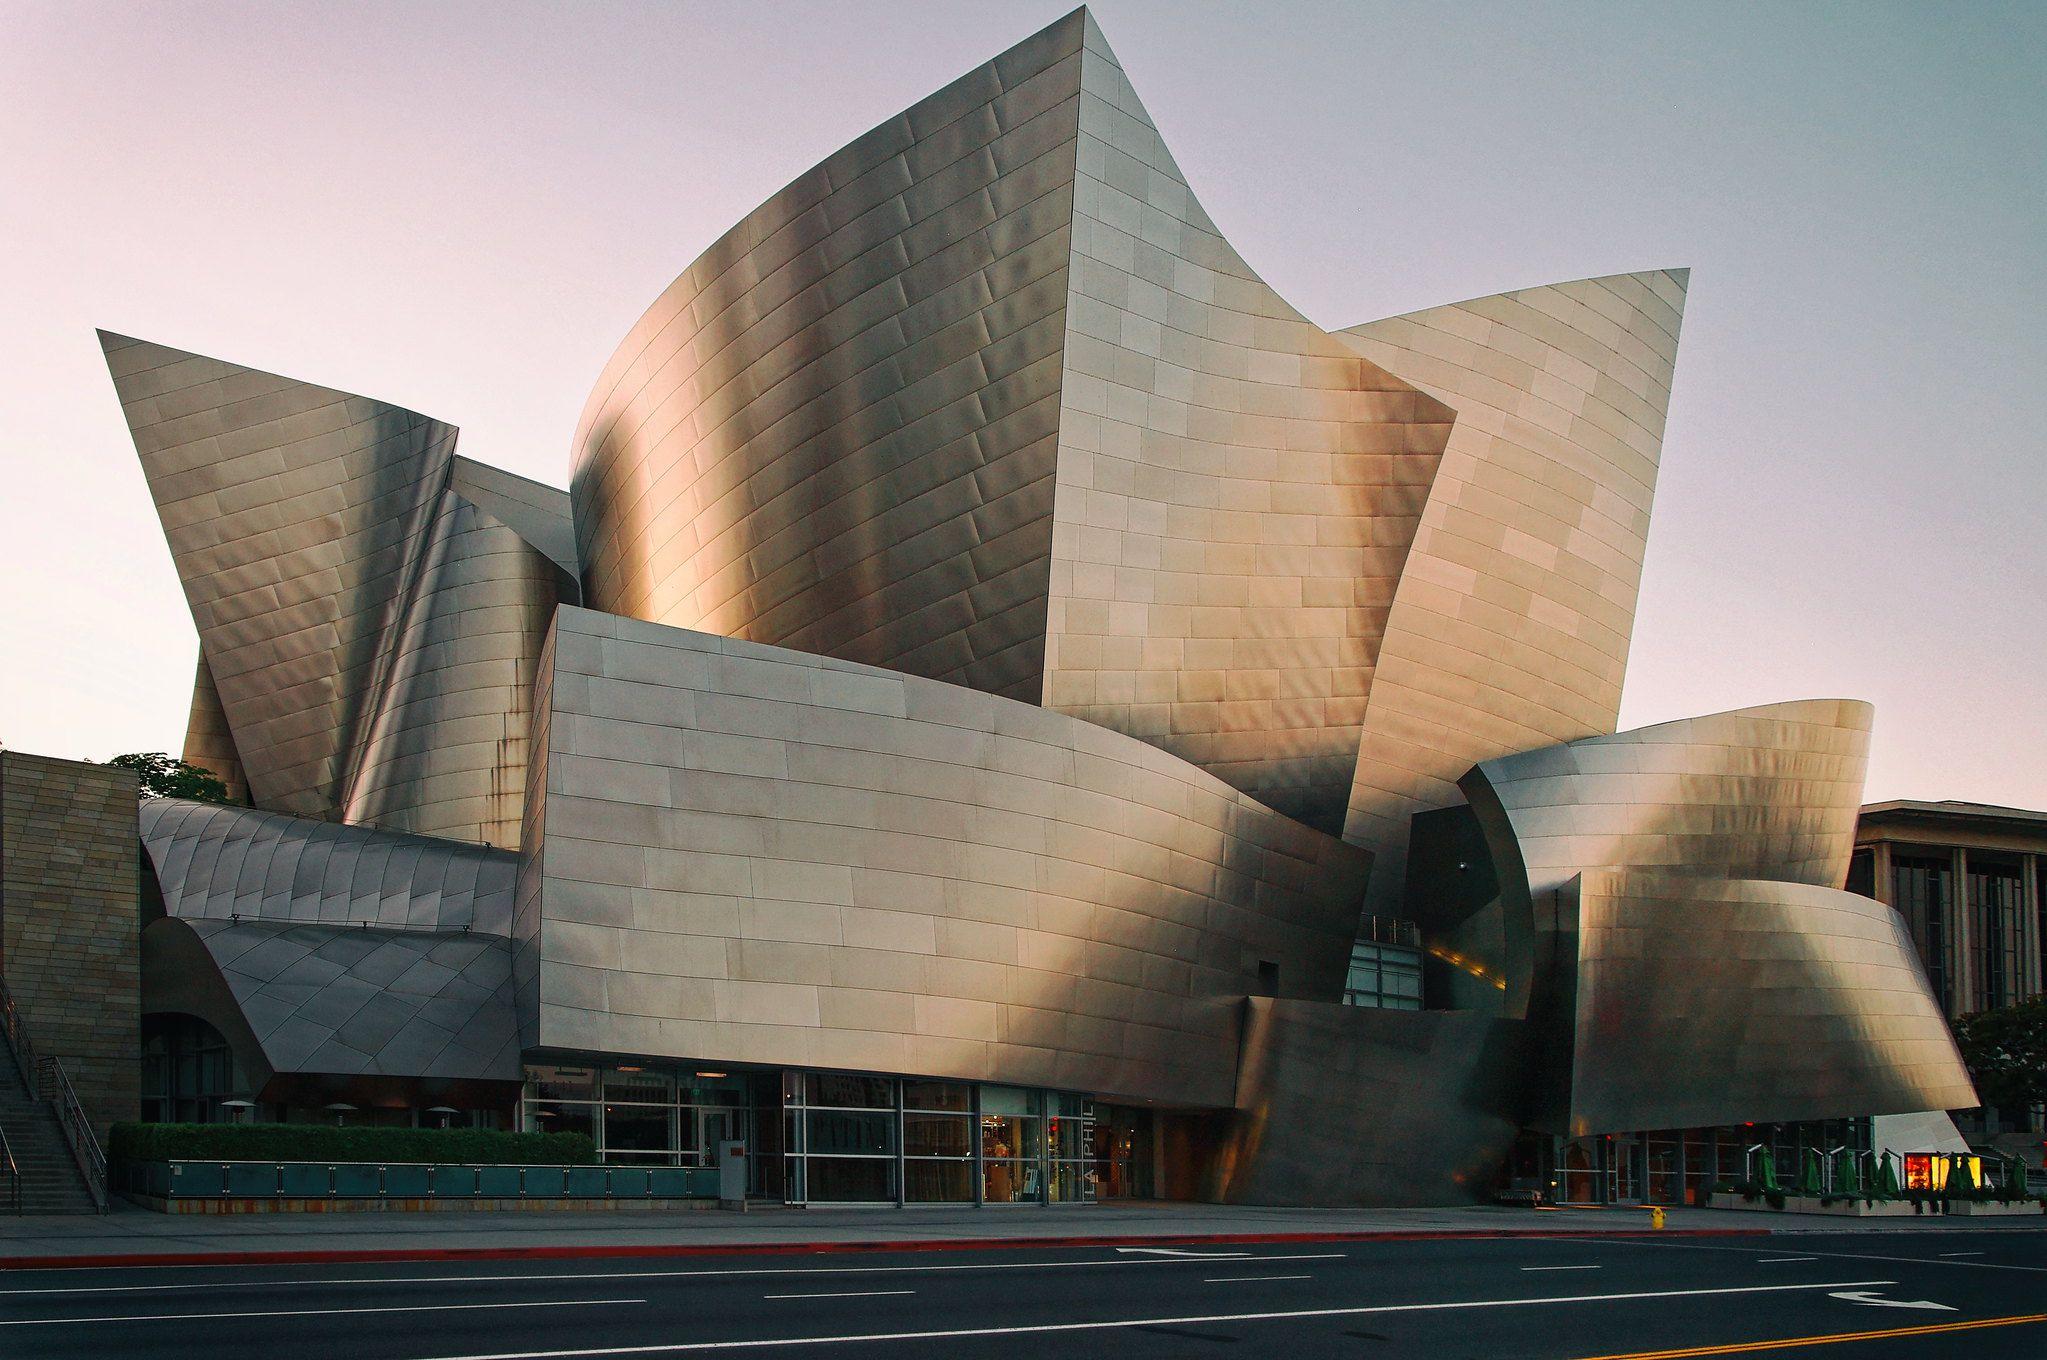 Imgp5256 Dxo 1 Dxo Analog Concert Hall Architecture Walt Disney Concert Hall Disney Hall